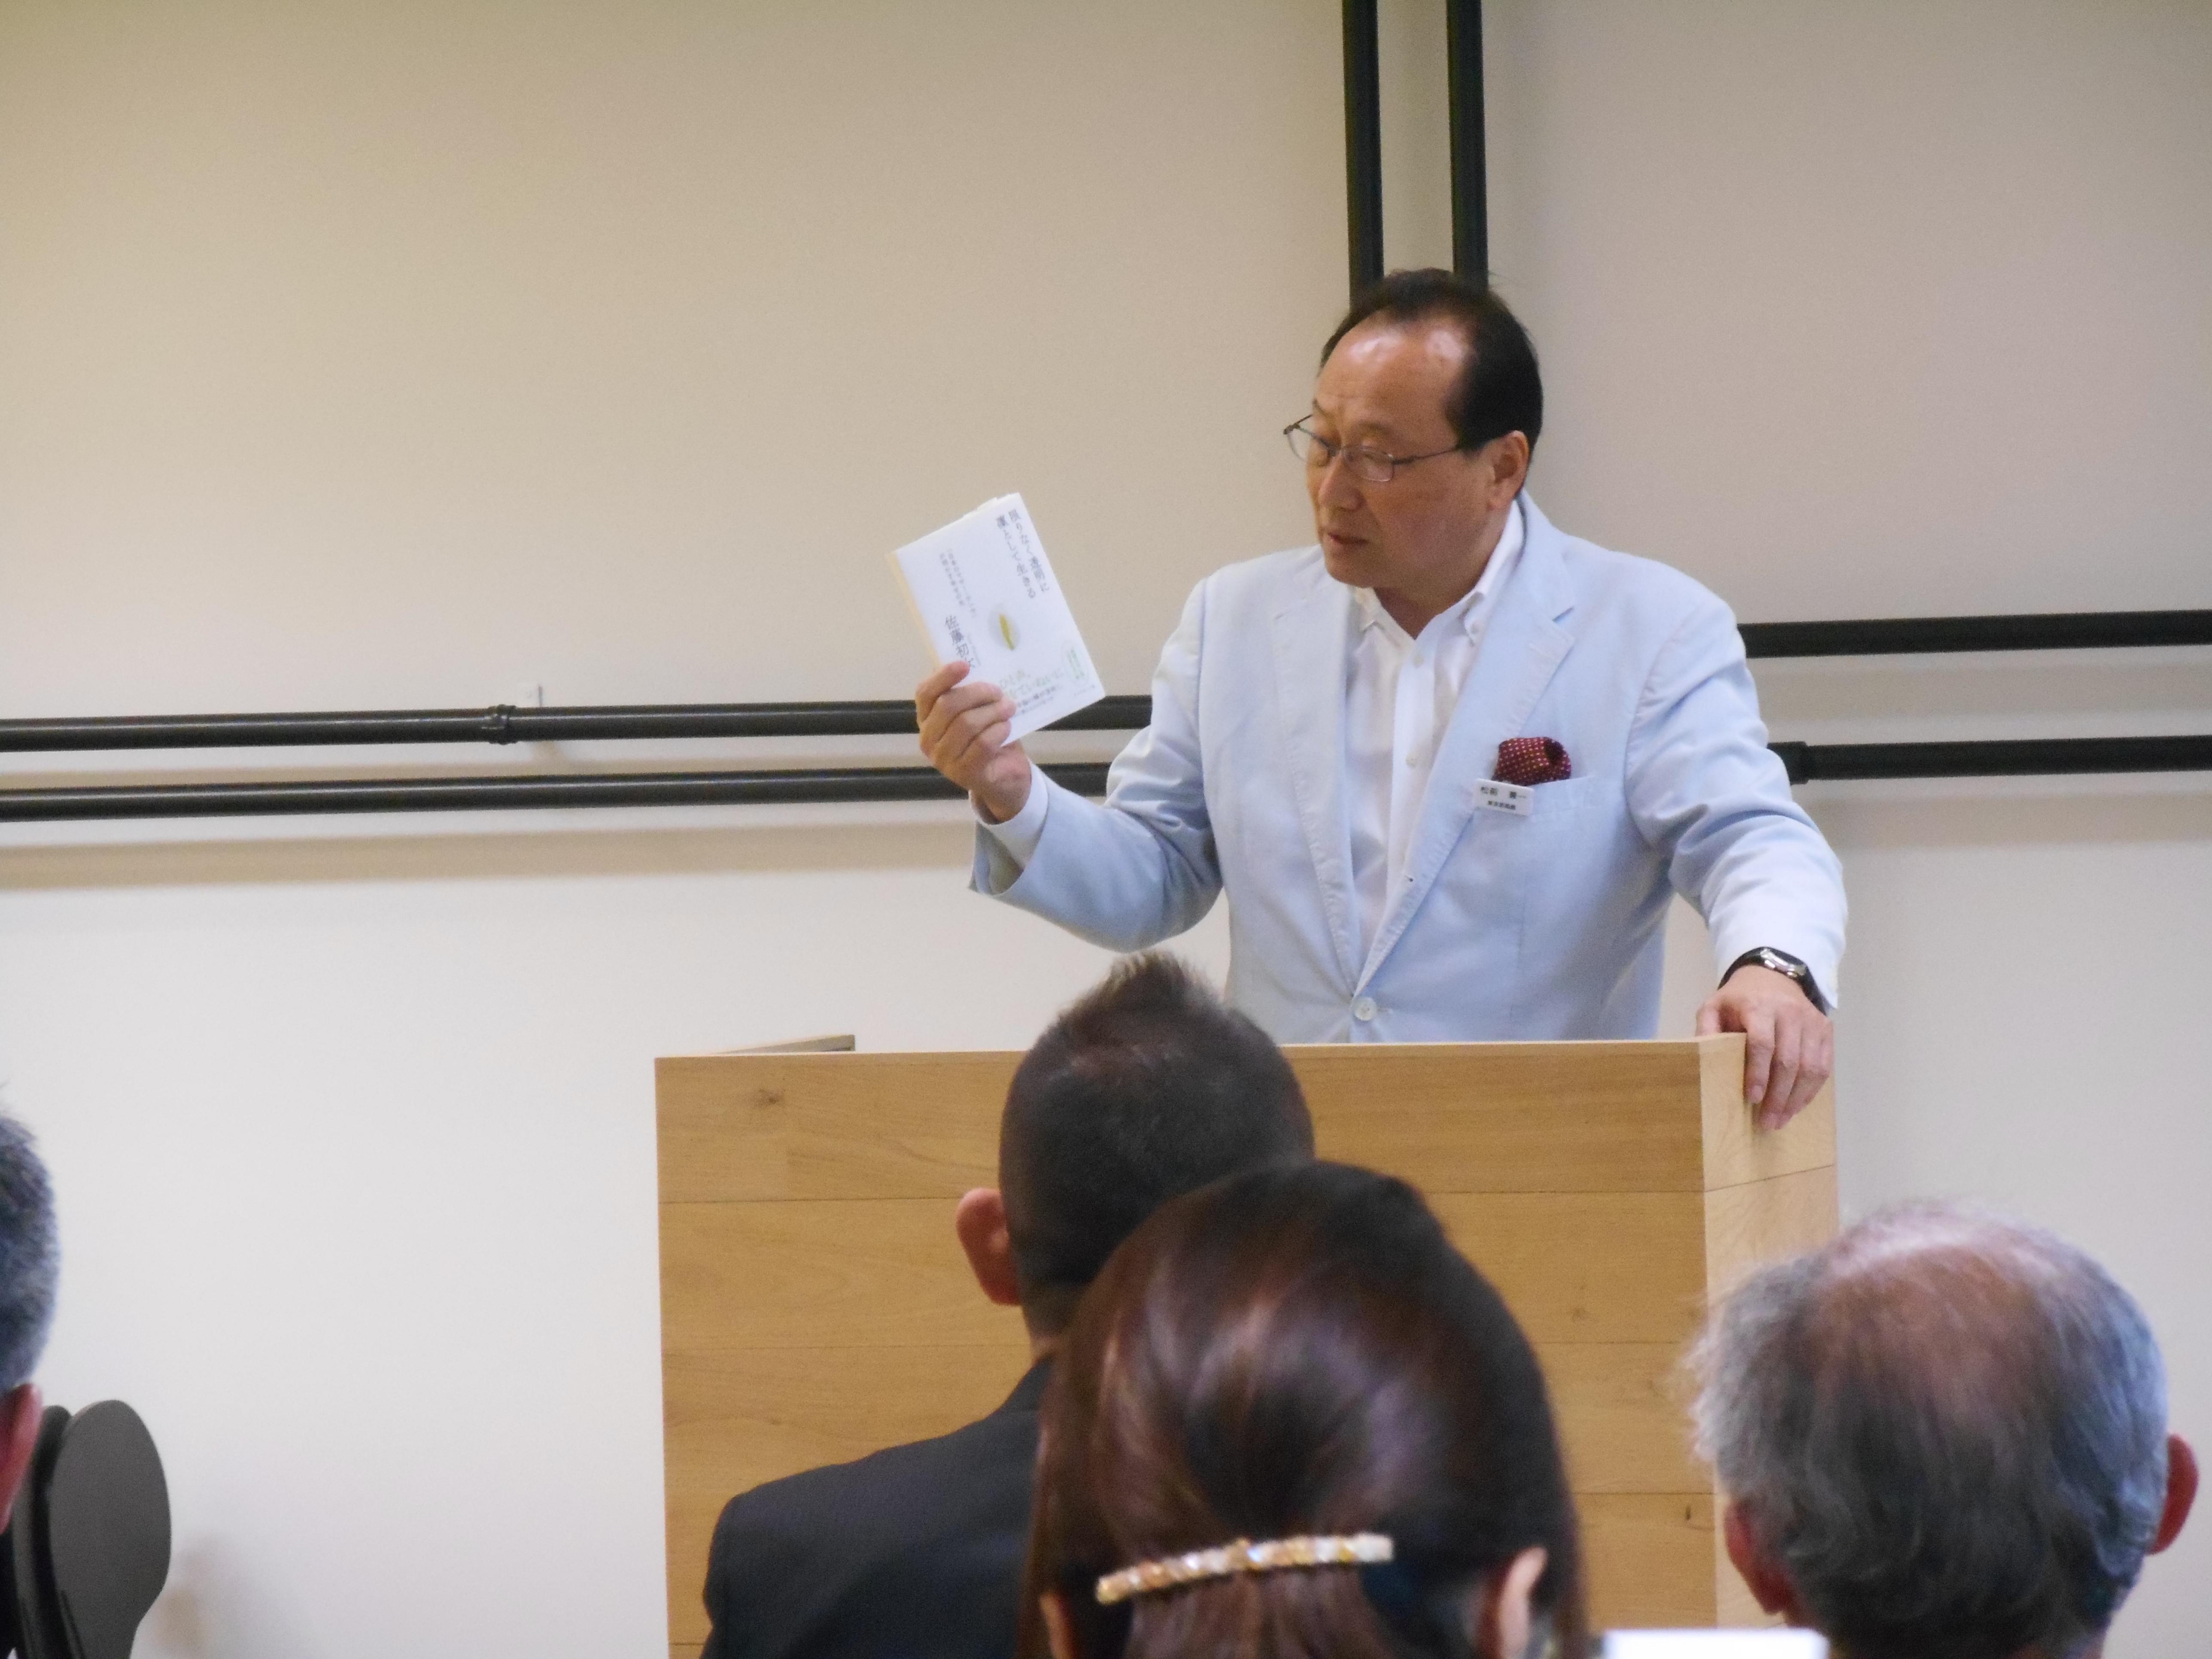 DSCN3711 1 - 4月1日東京思風塾の開催になります。